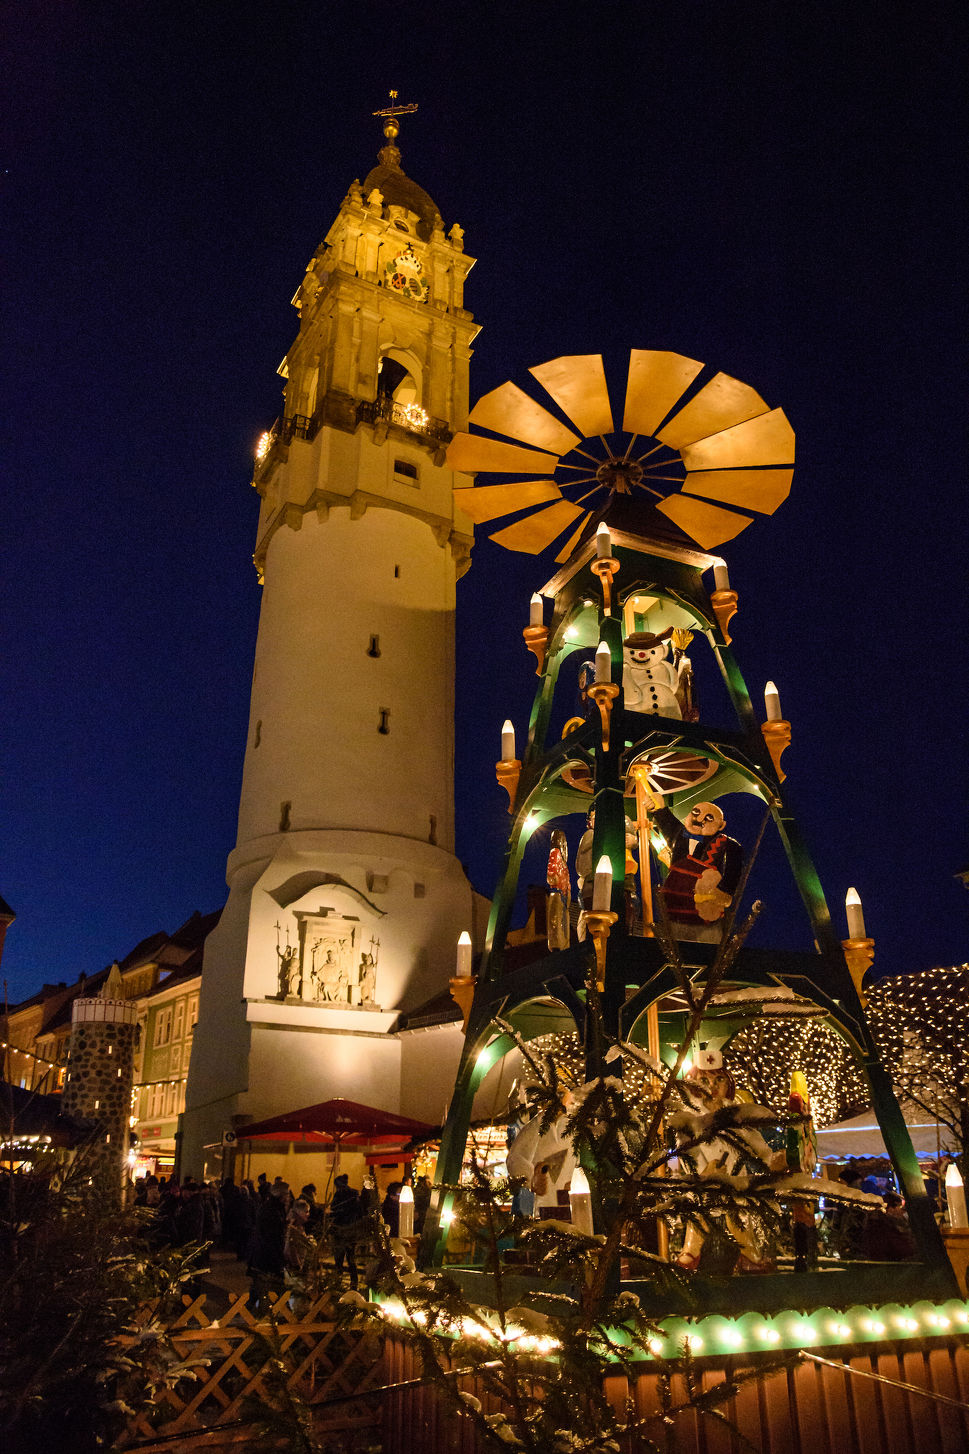 Bautzener Wenzelsmarkt in Bautzener